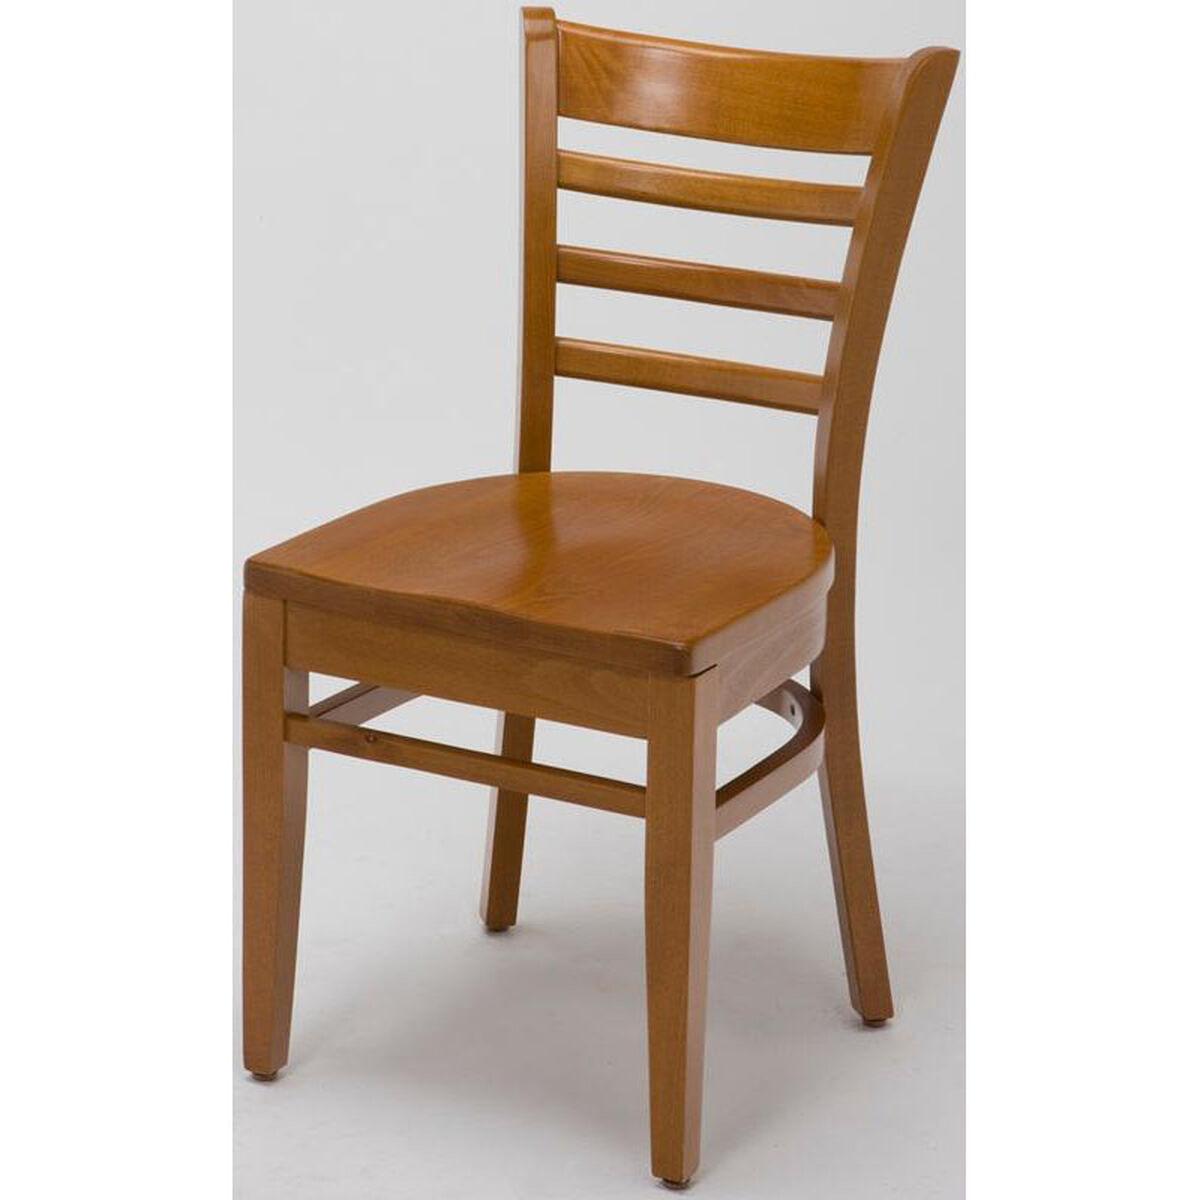 Cafe Chair Wood Seat 4505-WOOD   Bizchair.com